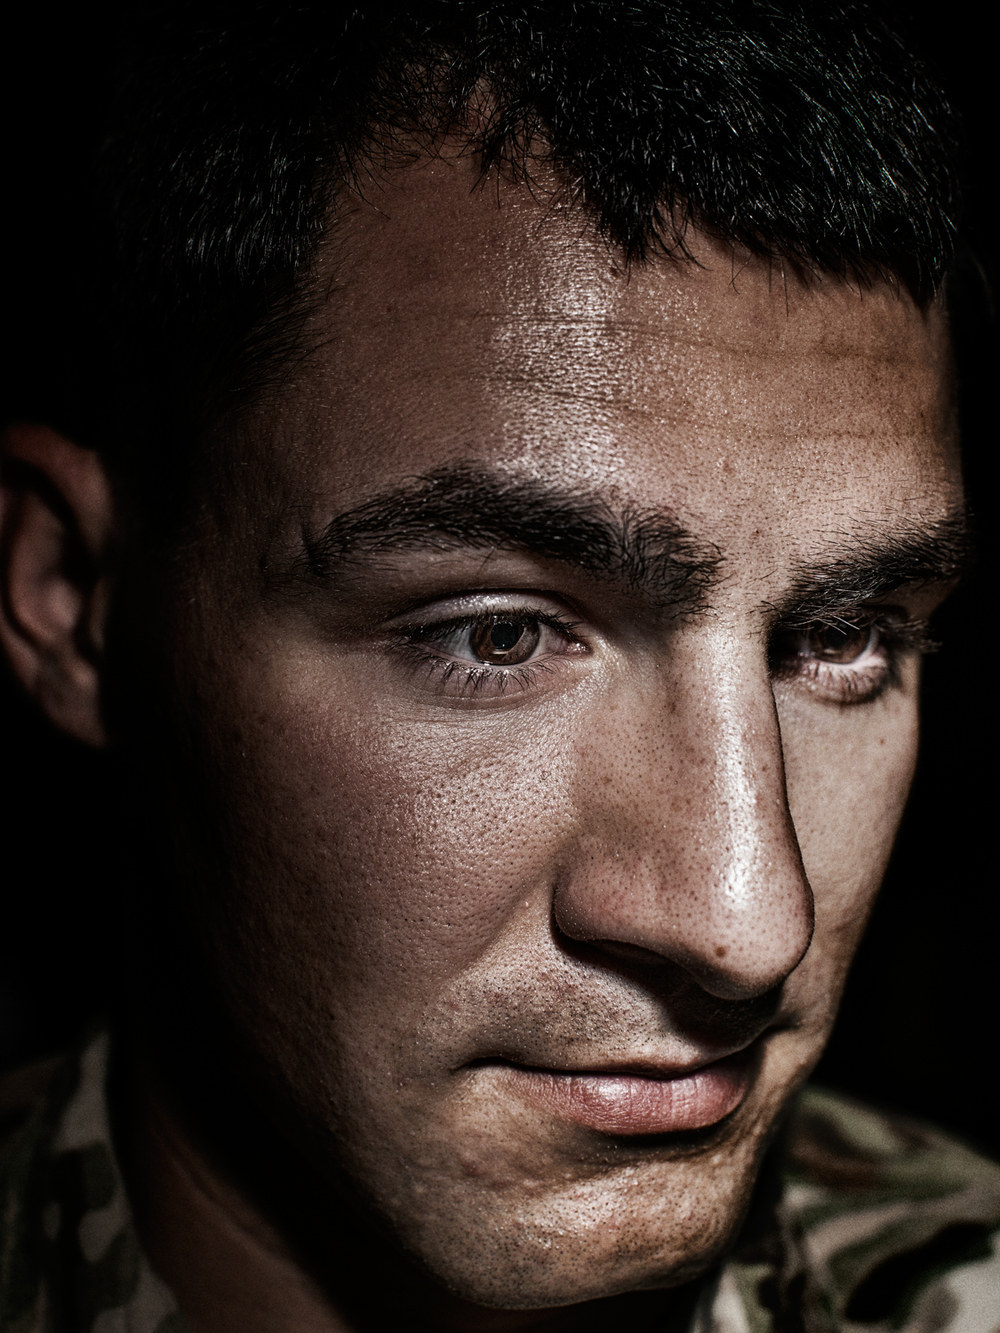 U.S. Army Specialist Ryan Michael Penix.